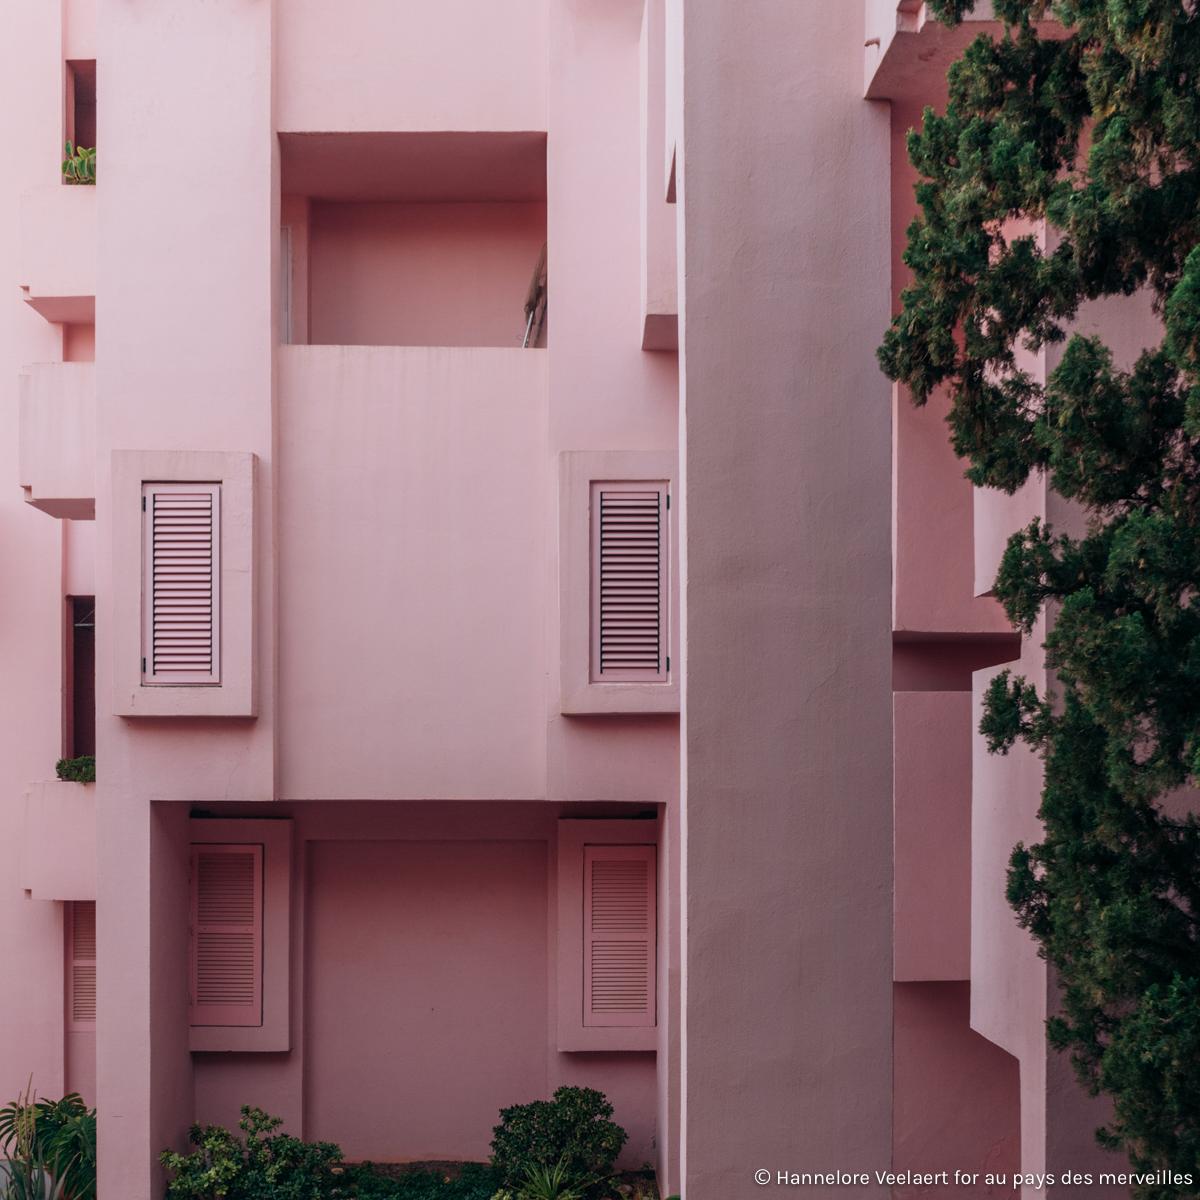 EXPLORED_ la muralla roja by Ricardo Bofill - Hannelore Veelaert for aupaysdesmerveillesblog.be